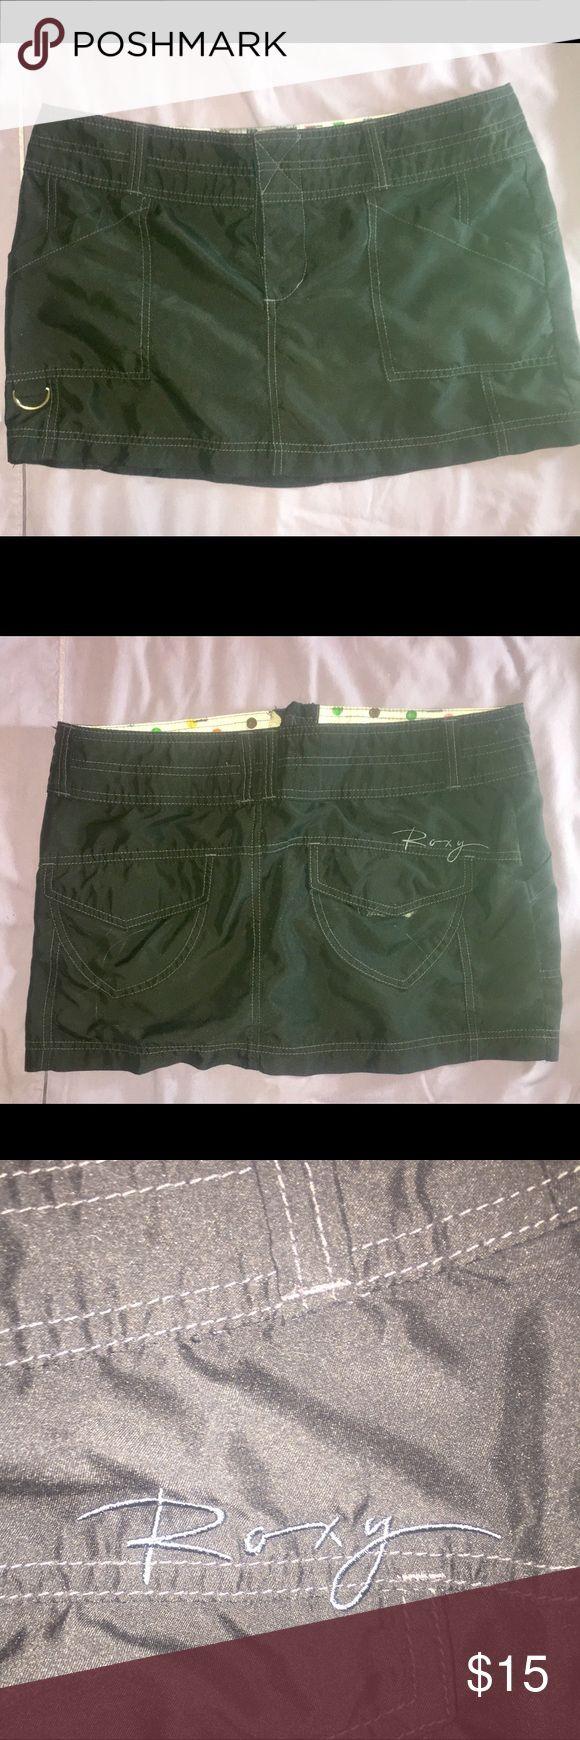 Roxy Black Mini Skirt Sexy shirt party skirt. So comfortable can wear all night! Size 7 Roxy Skirts Mini